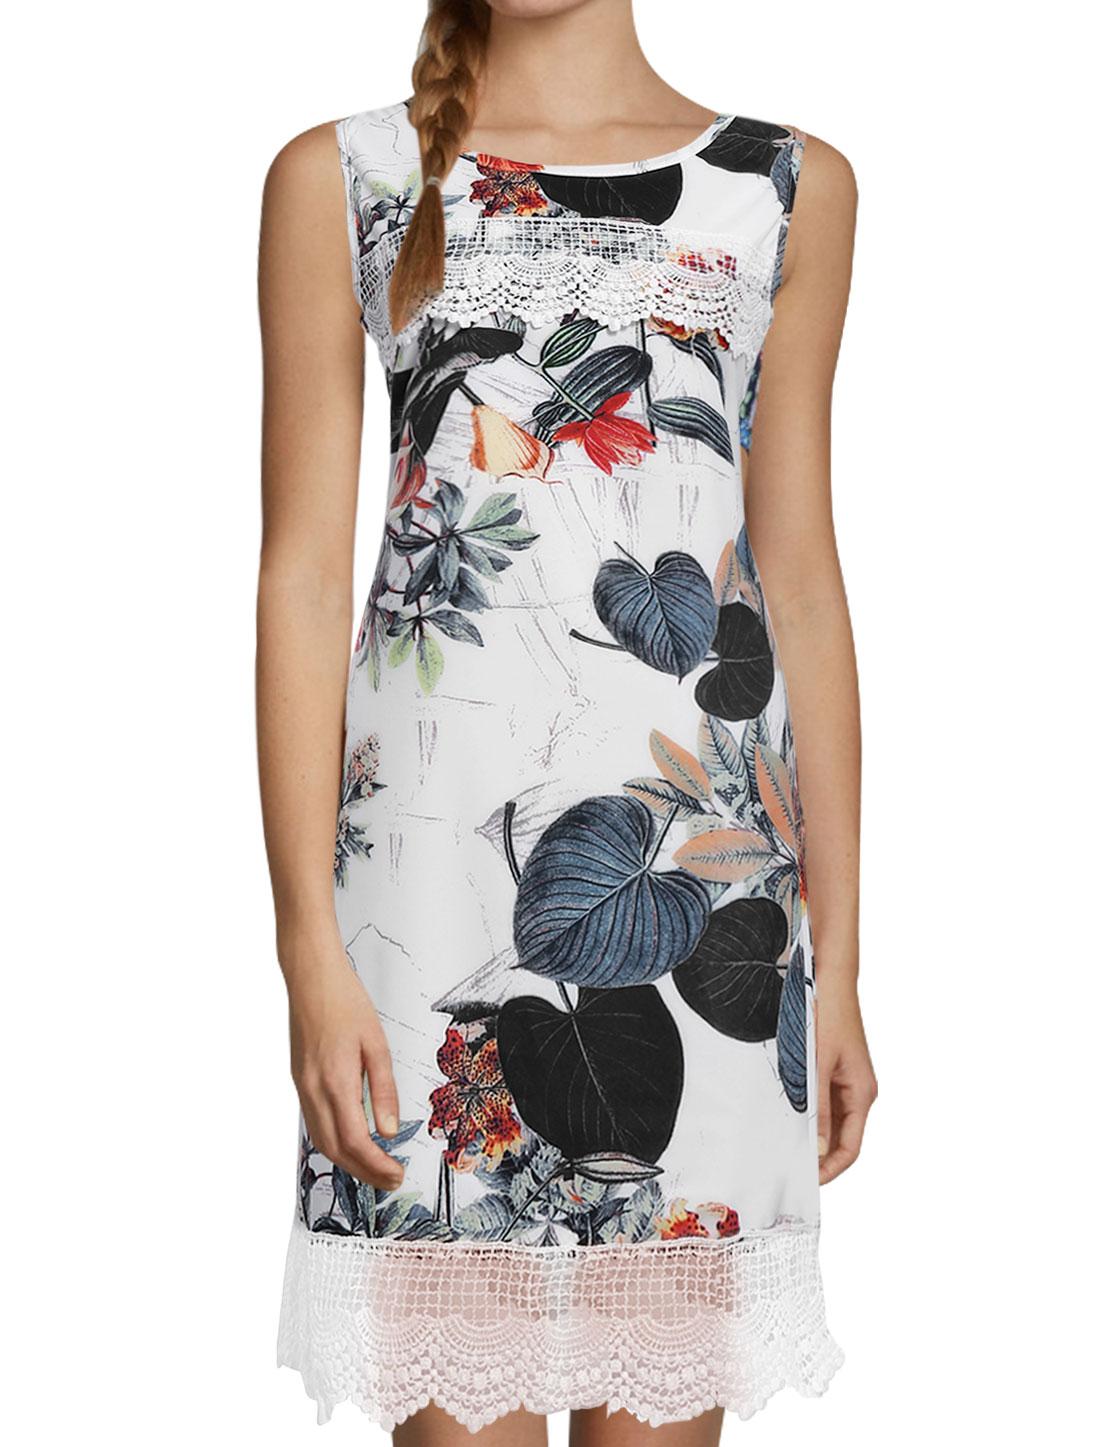 Women Sleeveless Floral Prints Panel Design Casual Dress White S